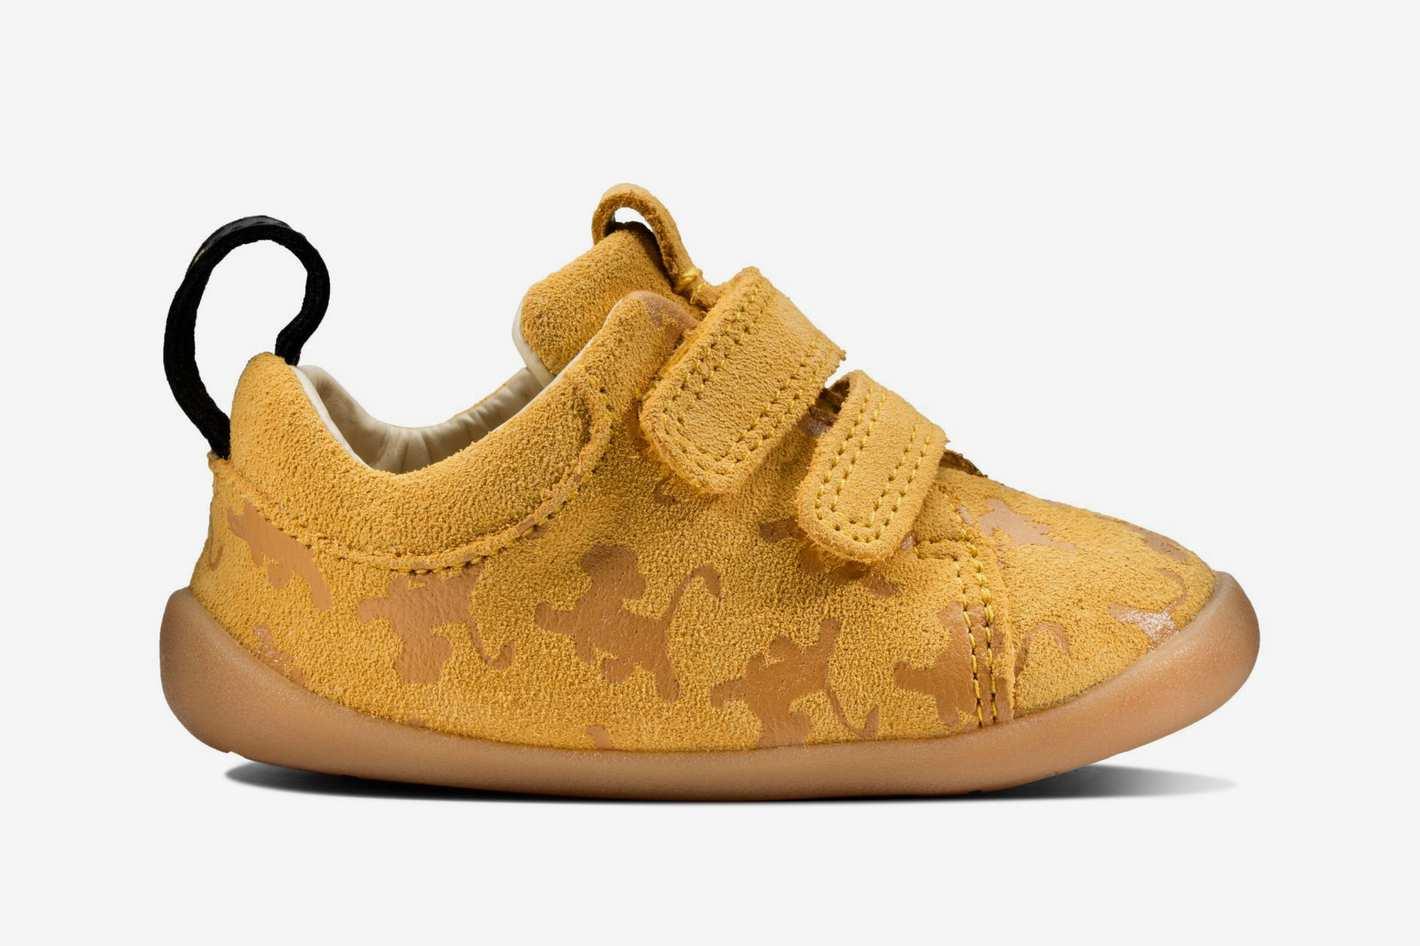 Clarks X Lion King Roamer Wild Toddler Shoe